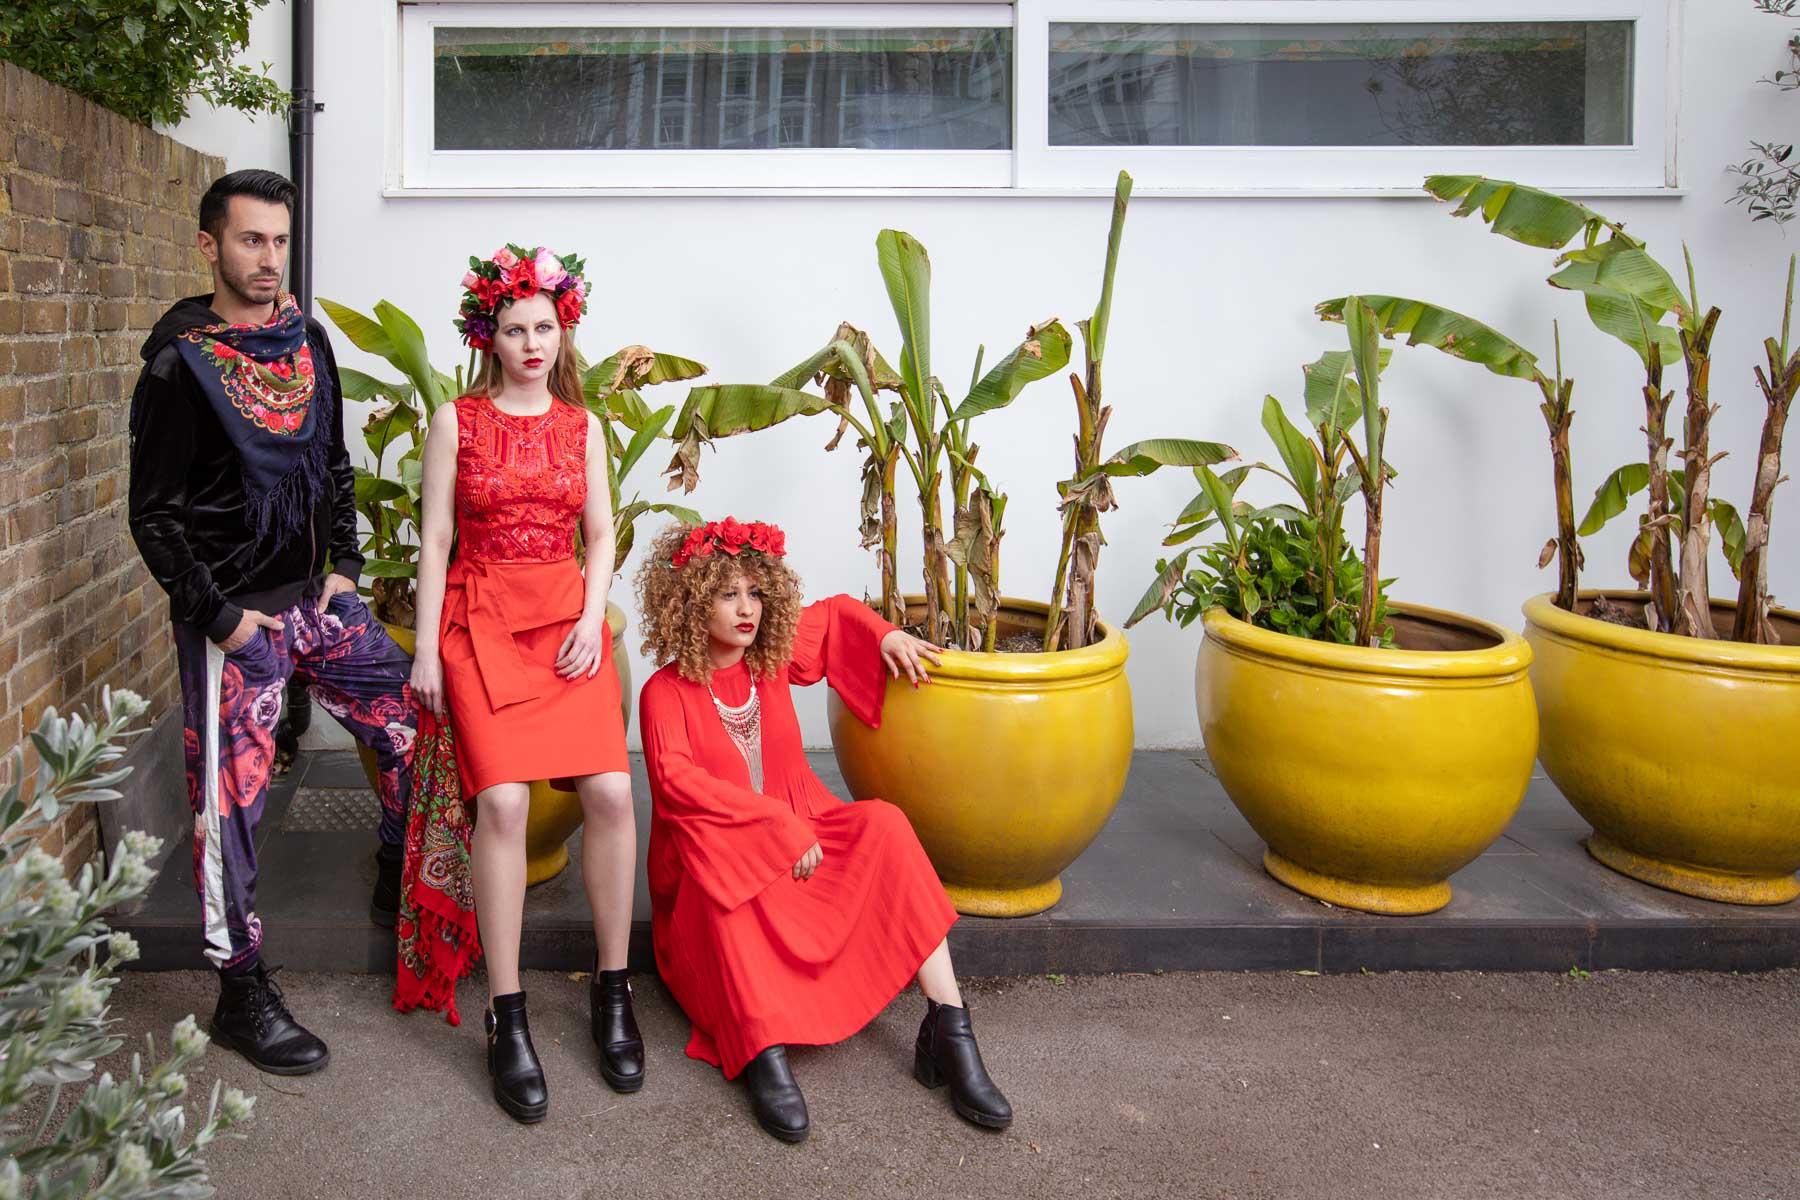 Russian-style-fashion-photographer-london-floral-Русский-стиль-мода-павловопосадский-платок-natalia-smith-photography-0040.jpg